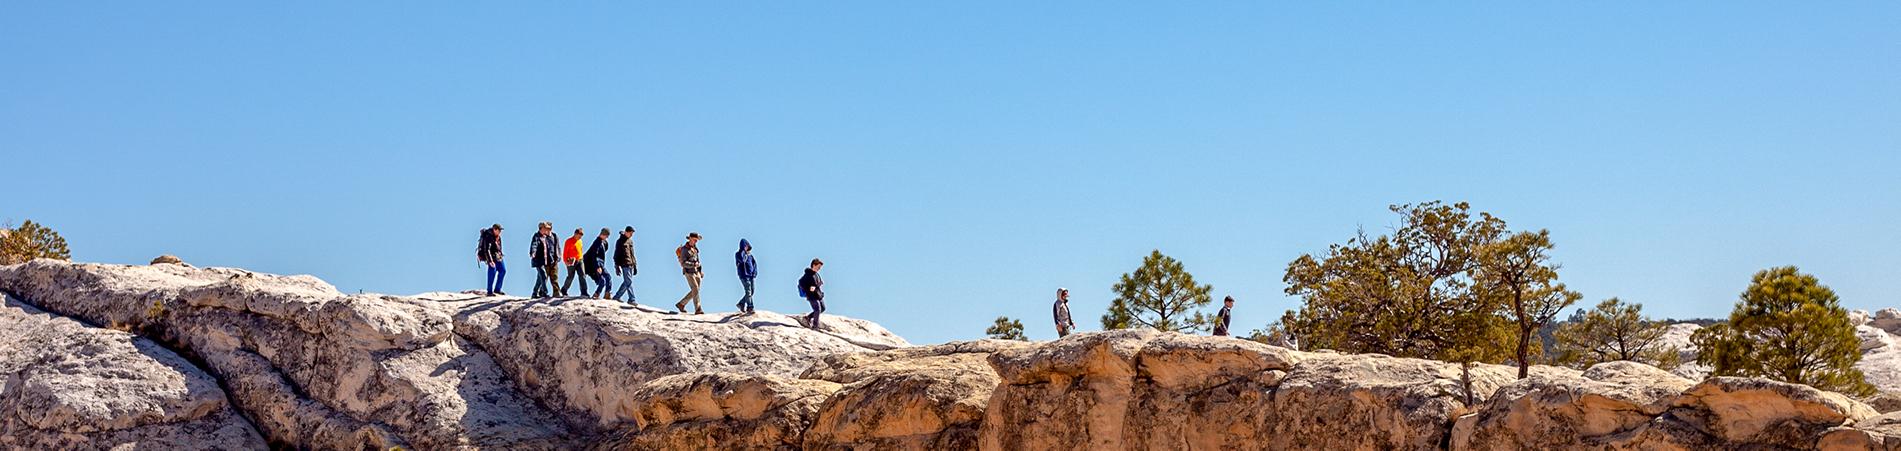 El Morro Hike